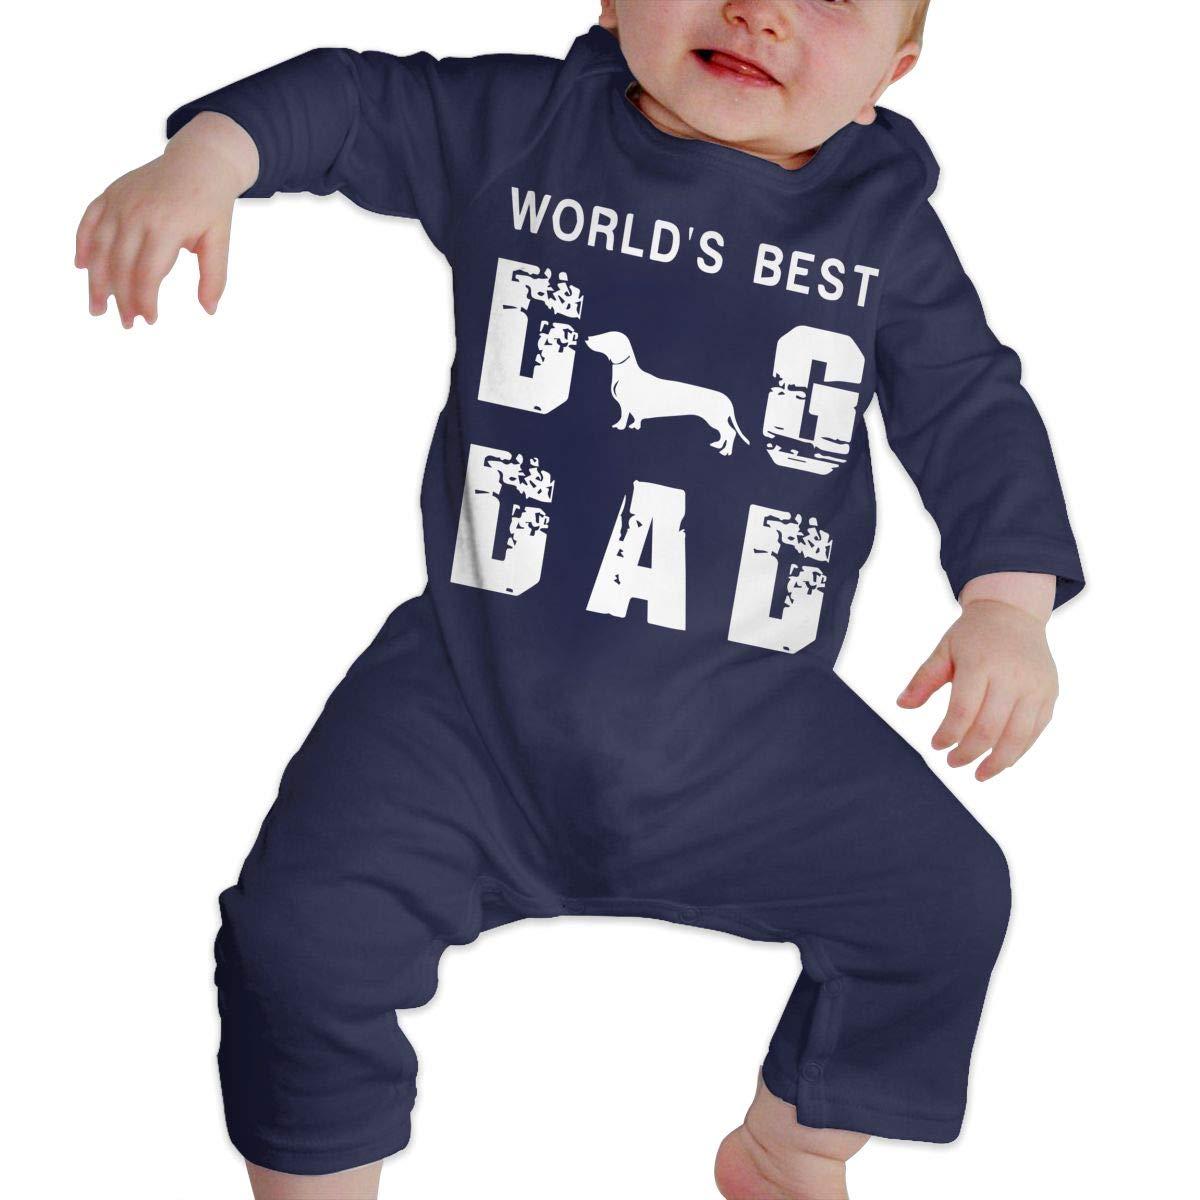 Worlds Best Dog Dad Baby Boy Girl Long Sleeve Romper Jumpsuit